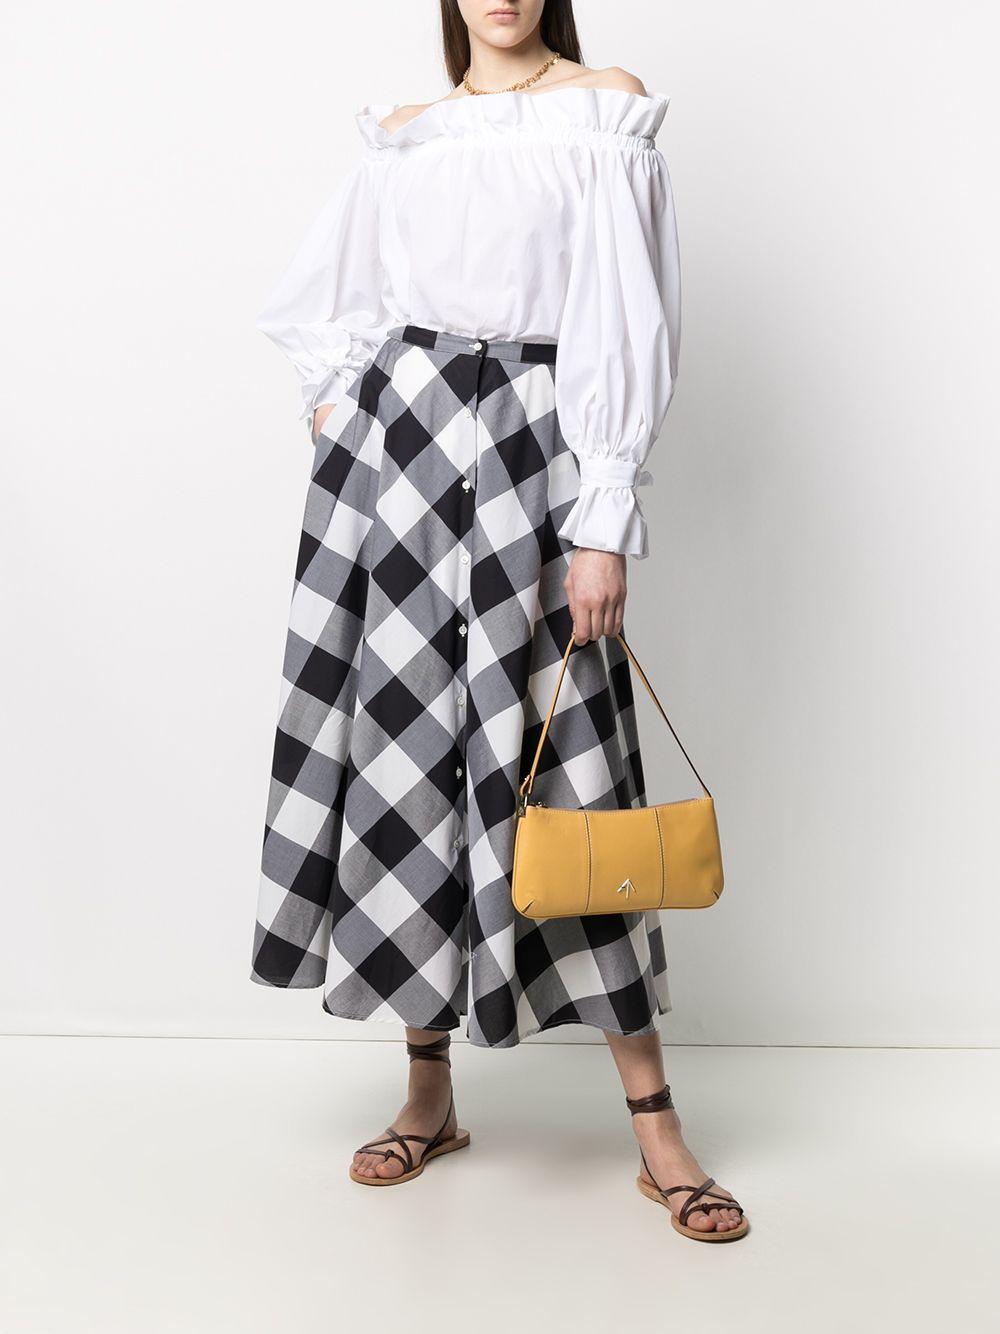 White cotton drop-shoulder ruffled blouse featuring  ruffled detailing SARA ROKA |  | ISIDE-02-S21001